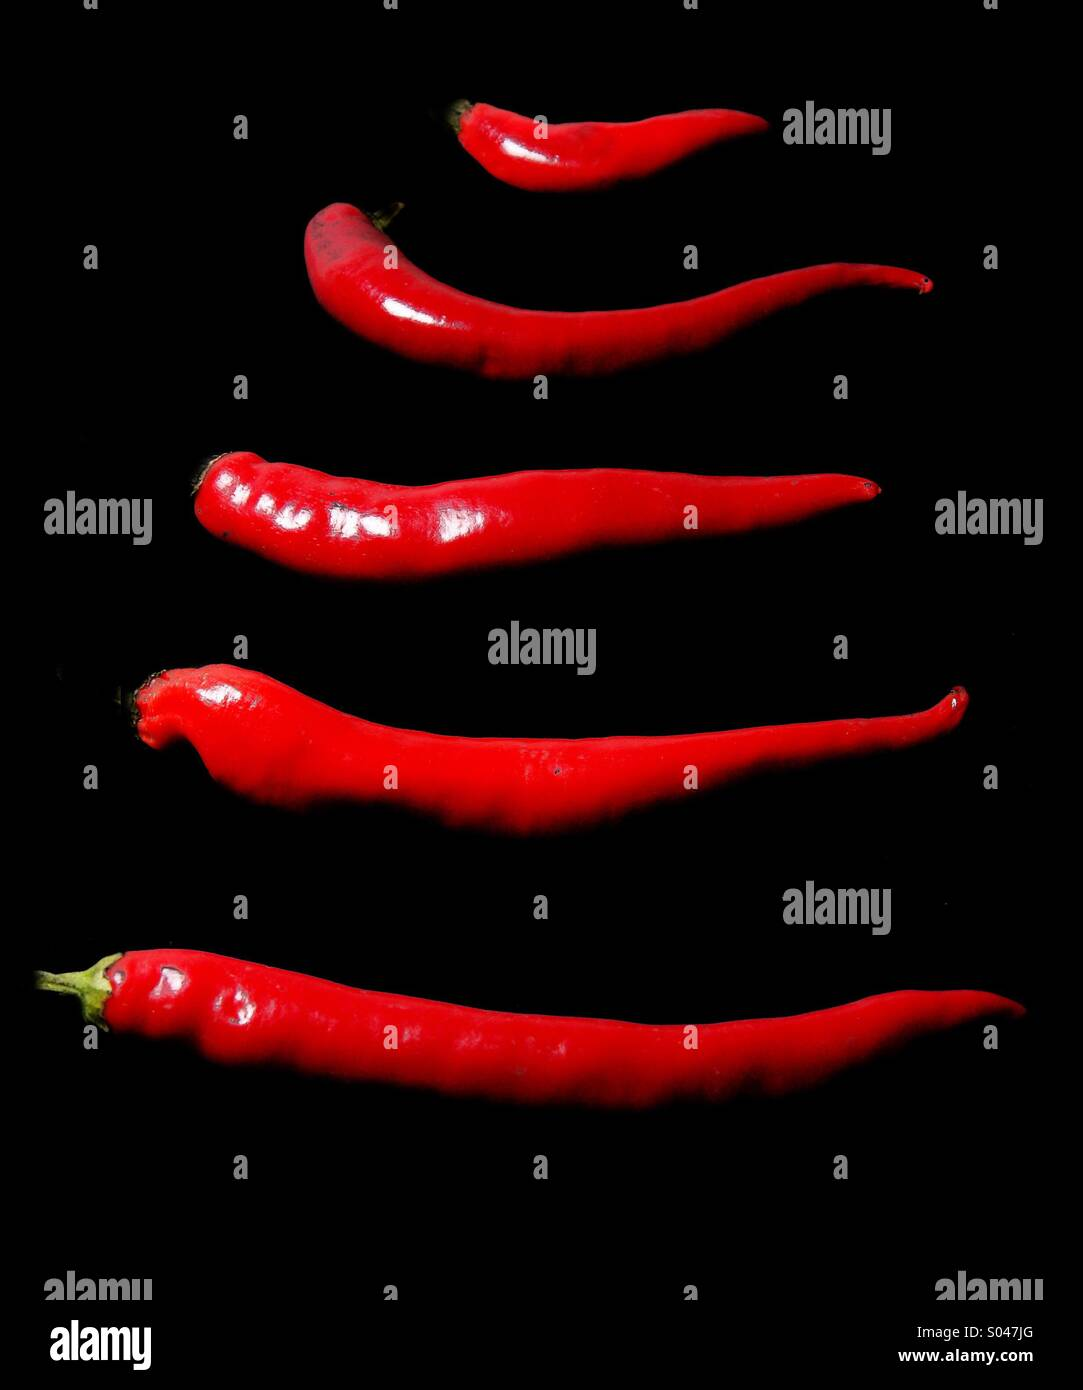 Rote Paprika Stockbild